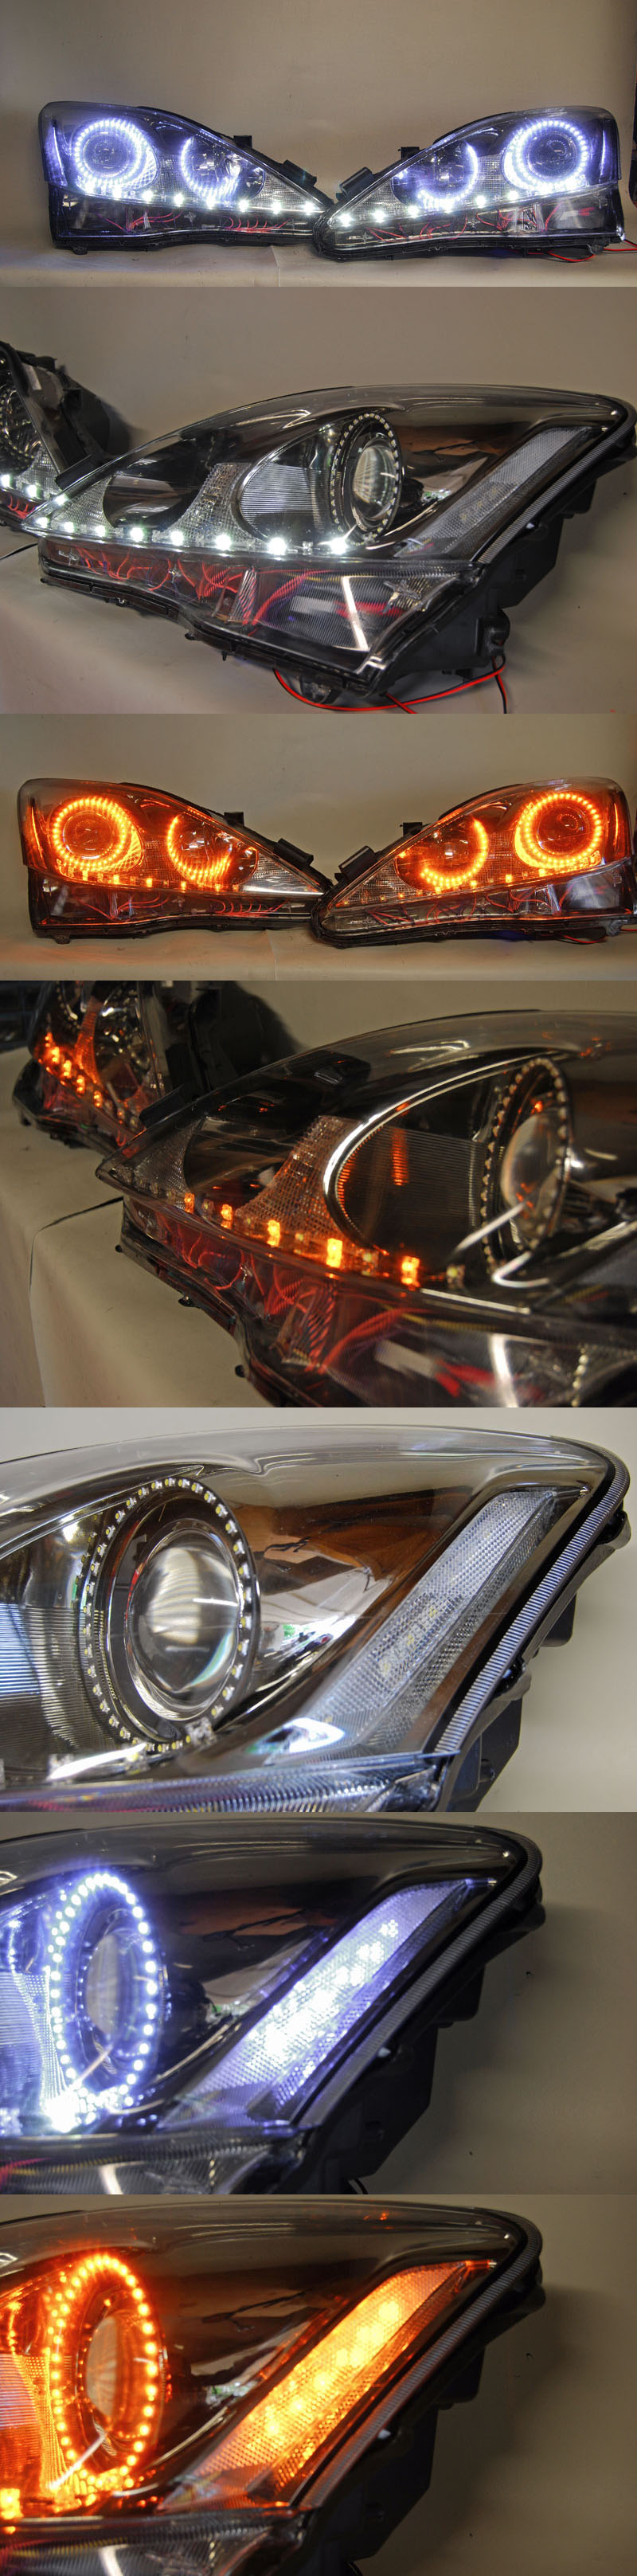 Black Chrome Isf Headlights W Srlss Clear Side Reflectors And Switchback Angel Eyes Car Accessories For Guys Bling Car Accessories Girly Car Accessories